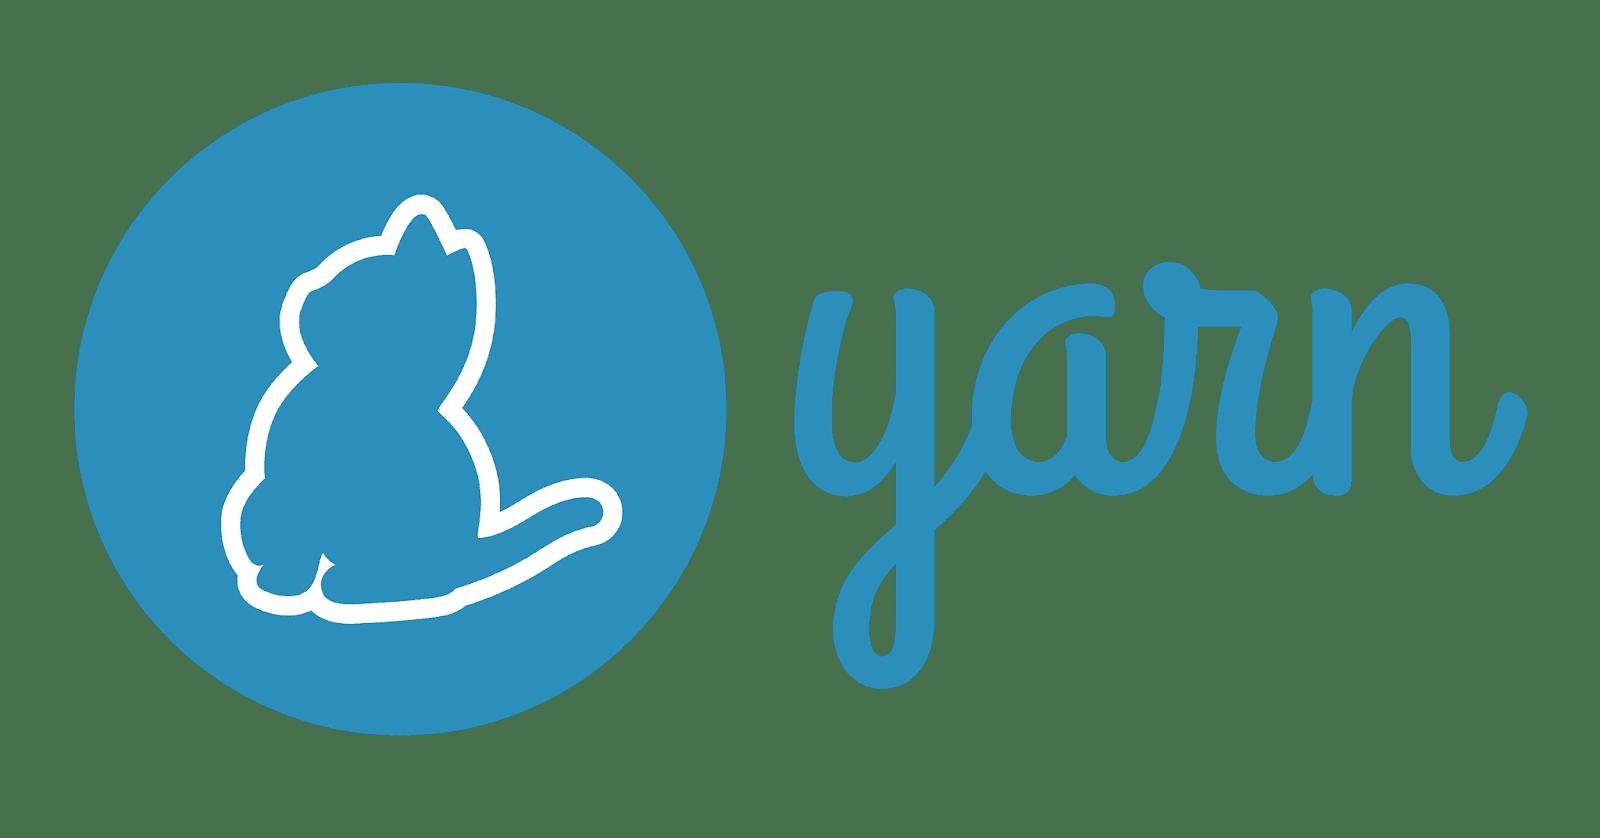 Run yarn in a different path, npm --prefix | Flummoxed by IT